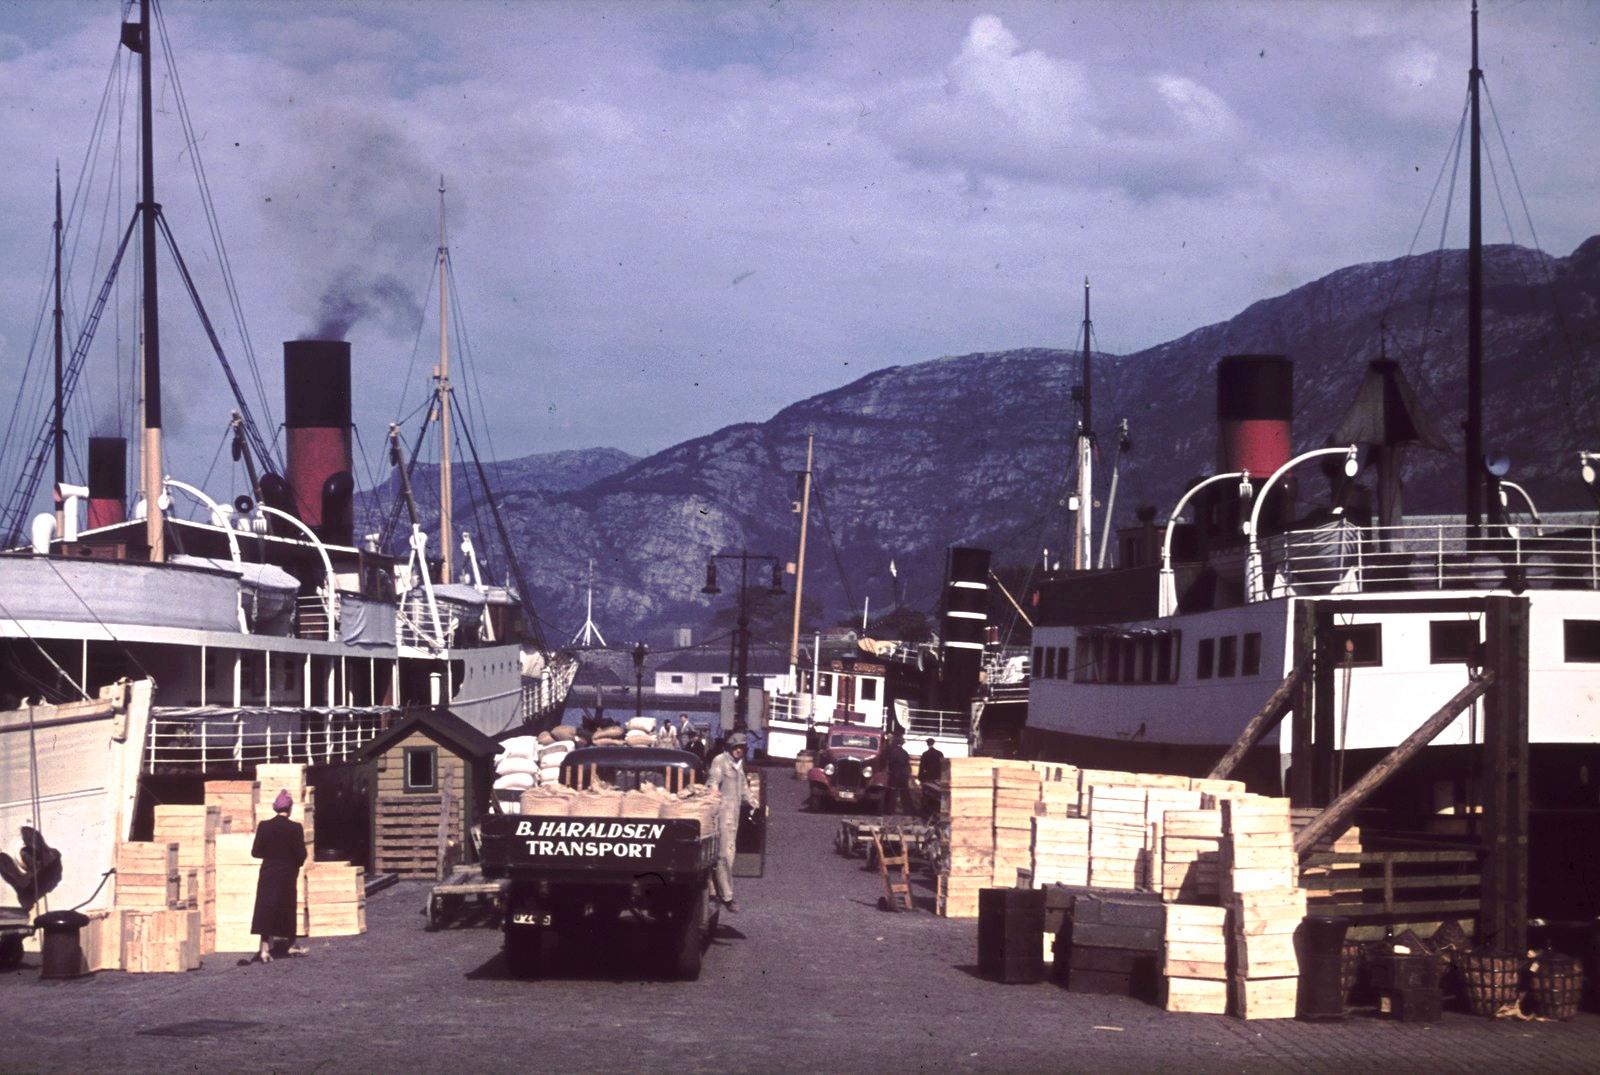 Берген. Набережная с двумя фьордными пароходами «Фанараакен» (слева) и «Басто» (справа)